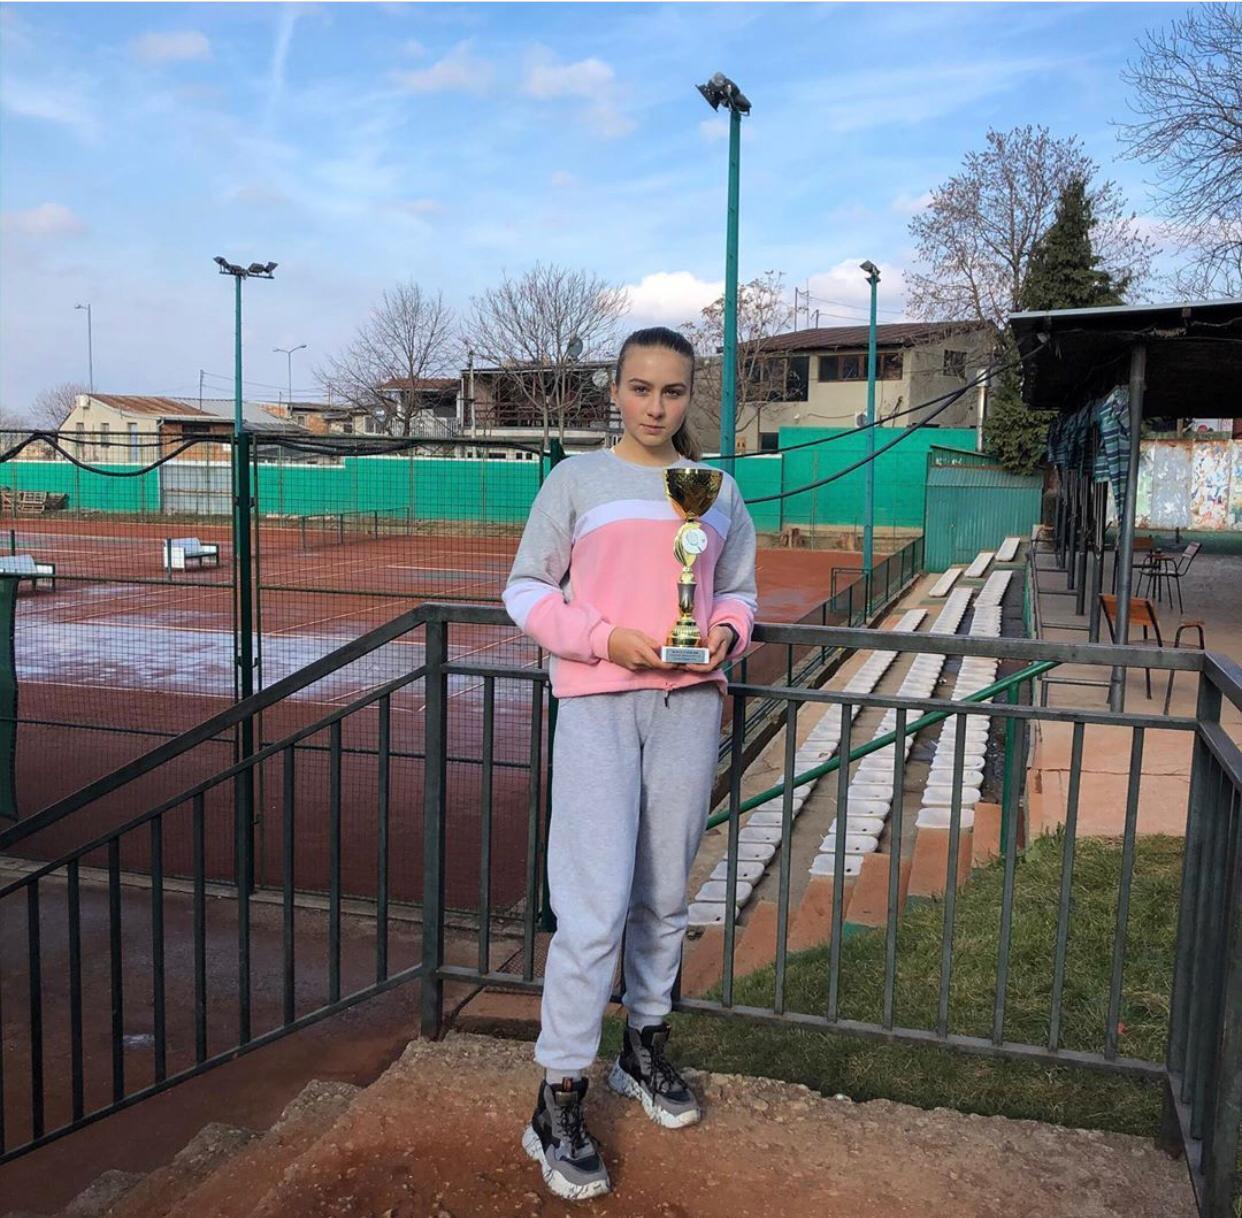 Международный юниорский турнир серии ITF «Bozicni Turnir» по теннису